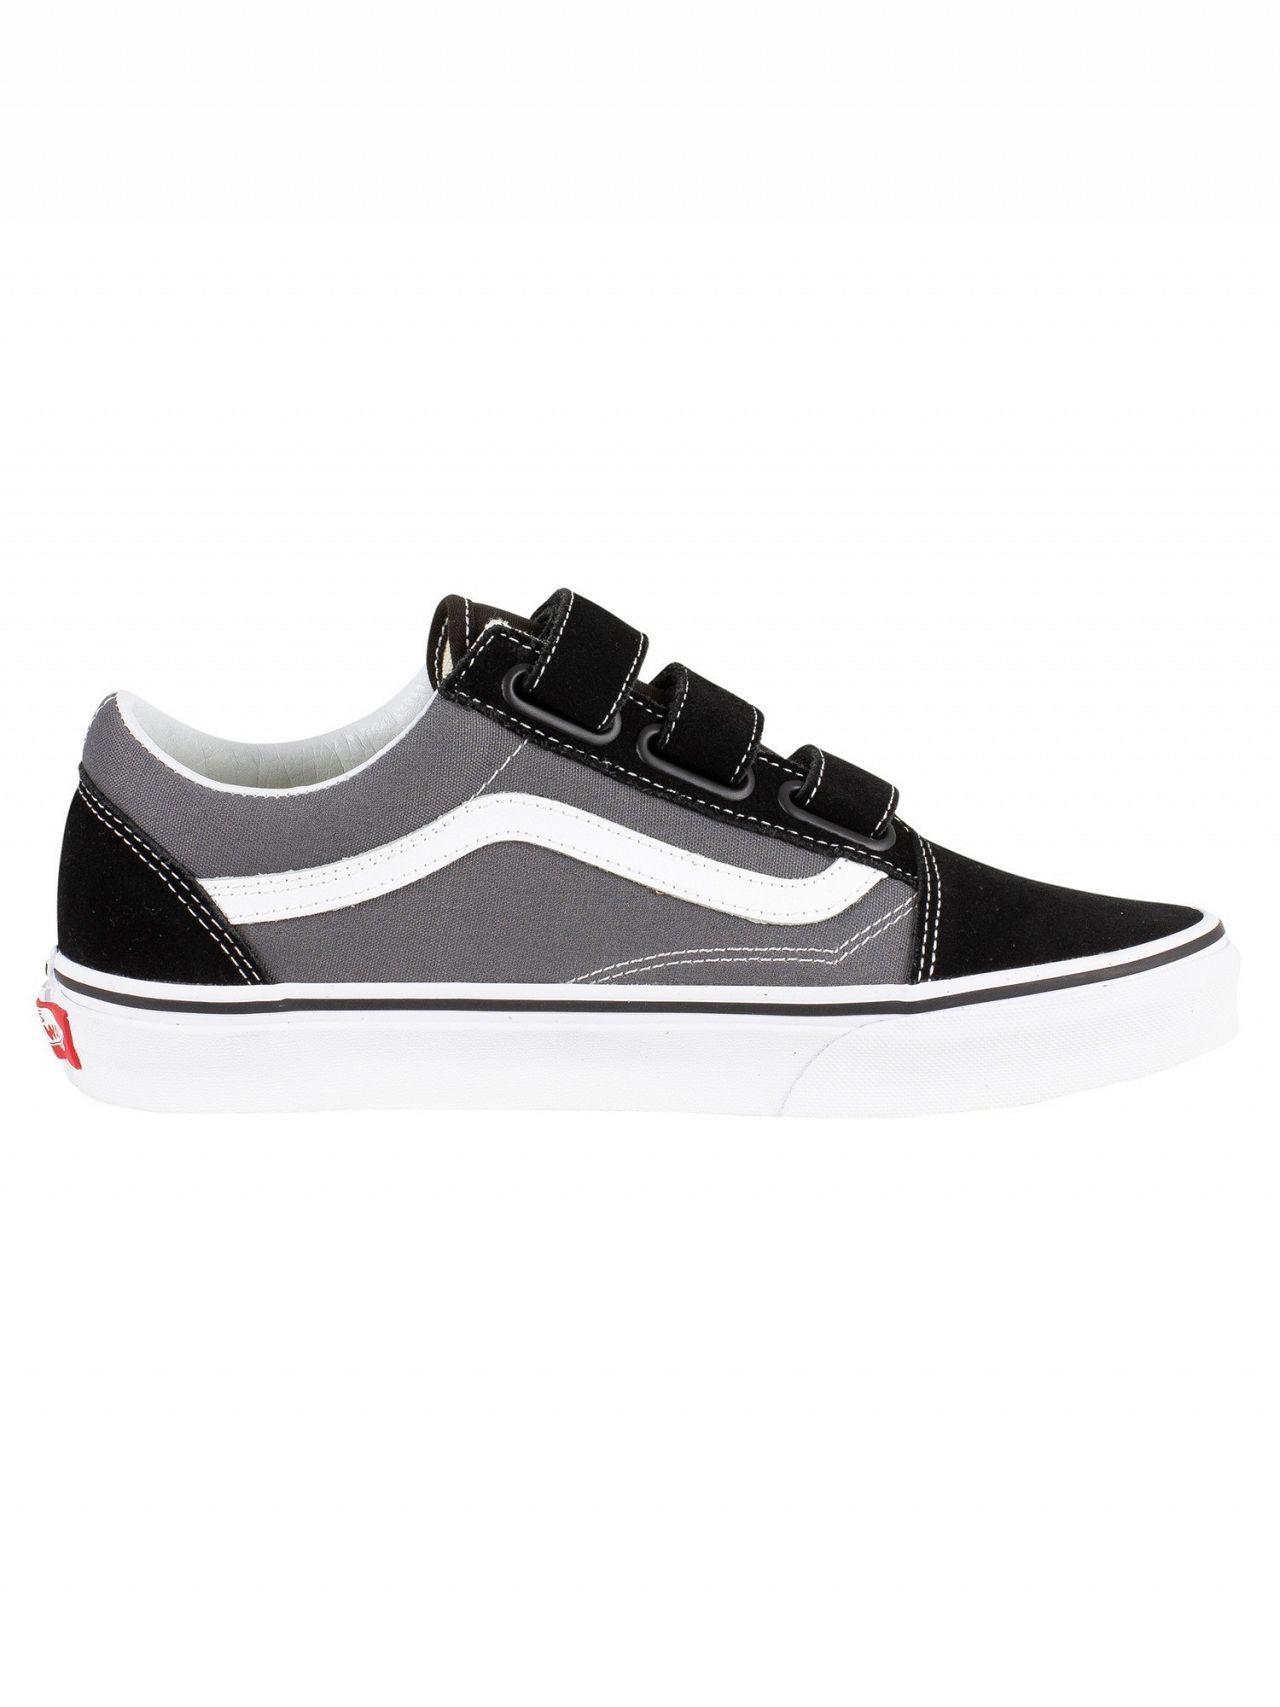 b5c8747814 Vans Pewter black Old Skool V Trainers in Black for Men - Lyst